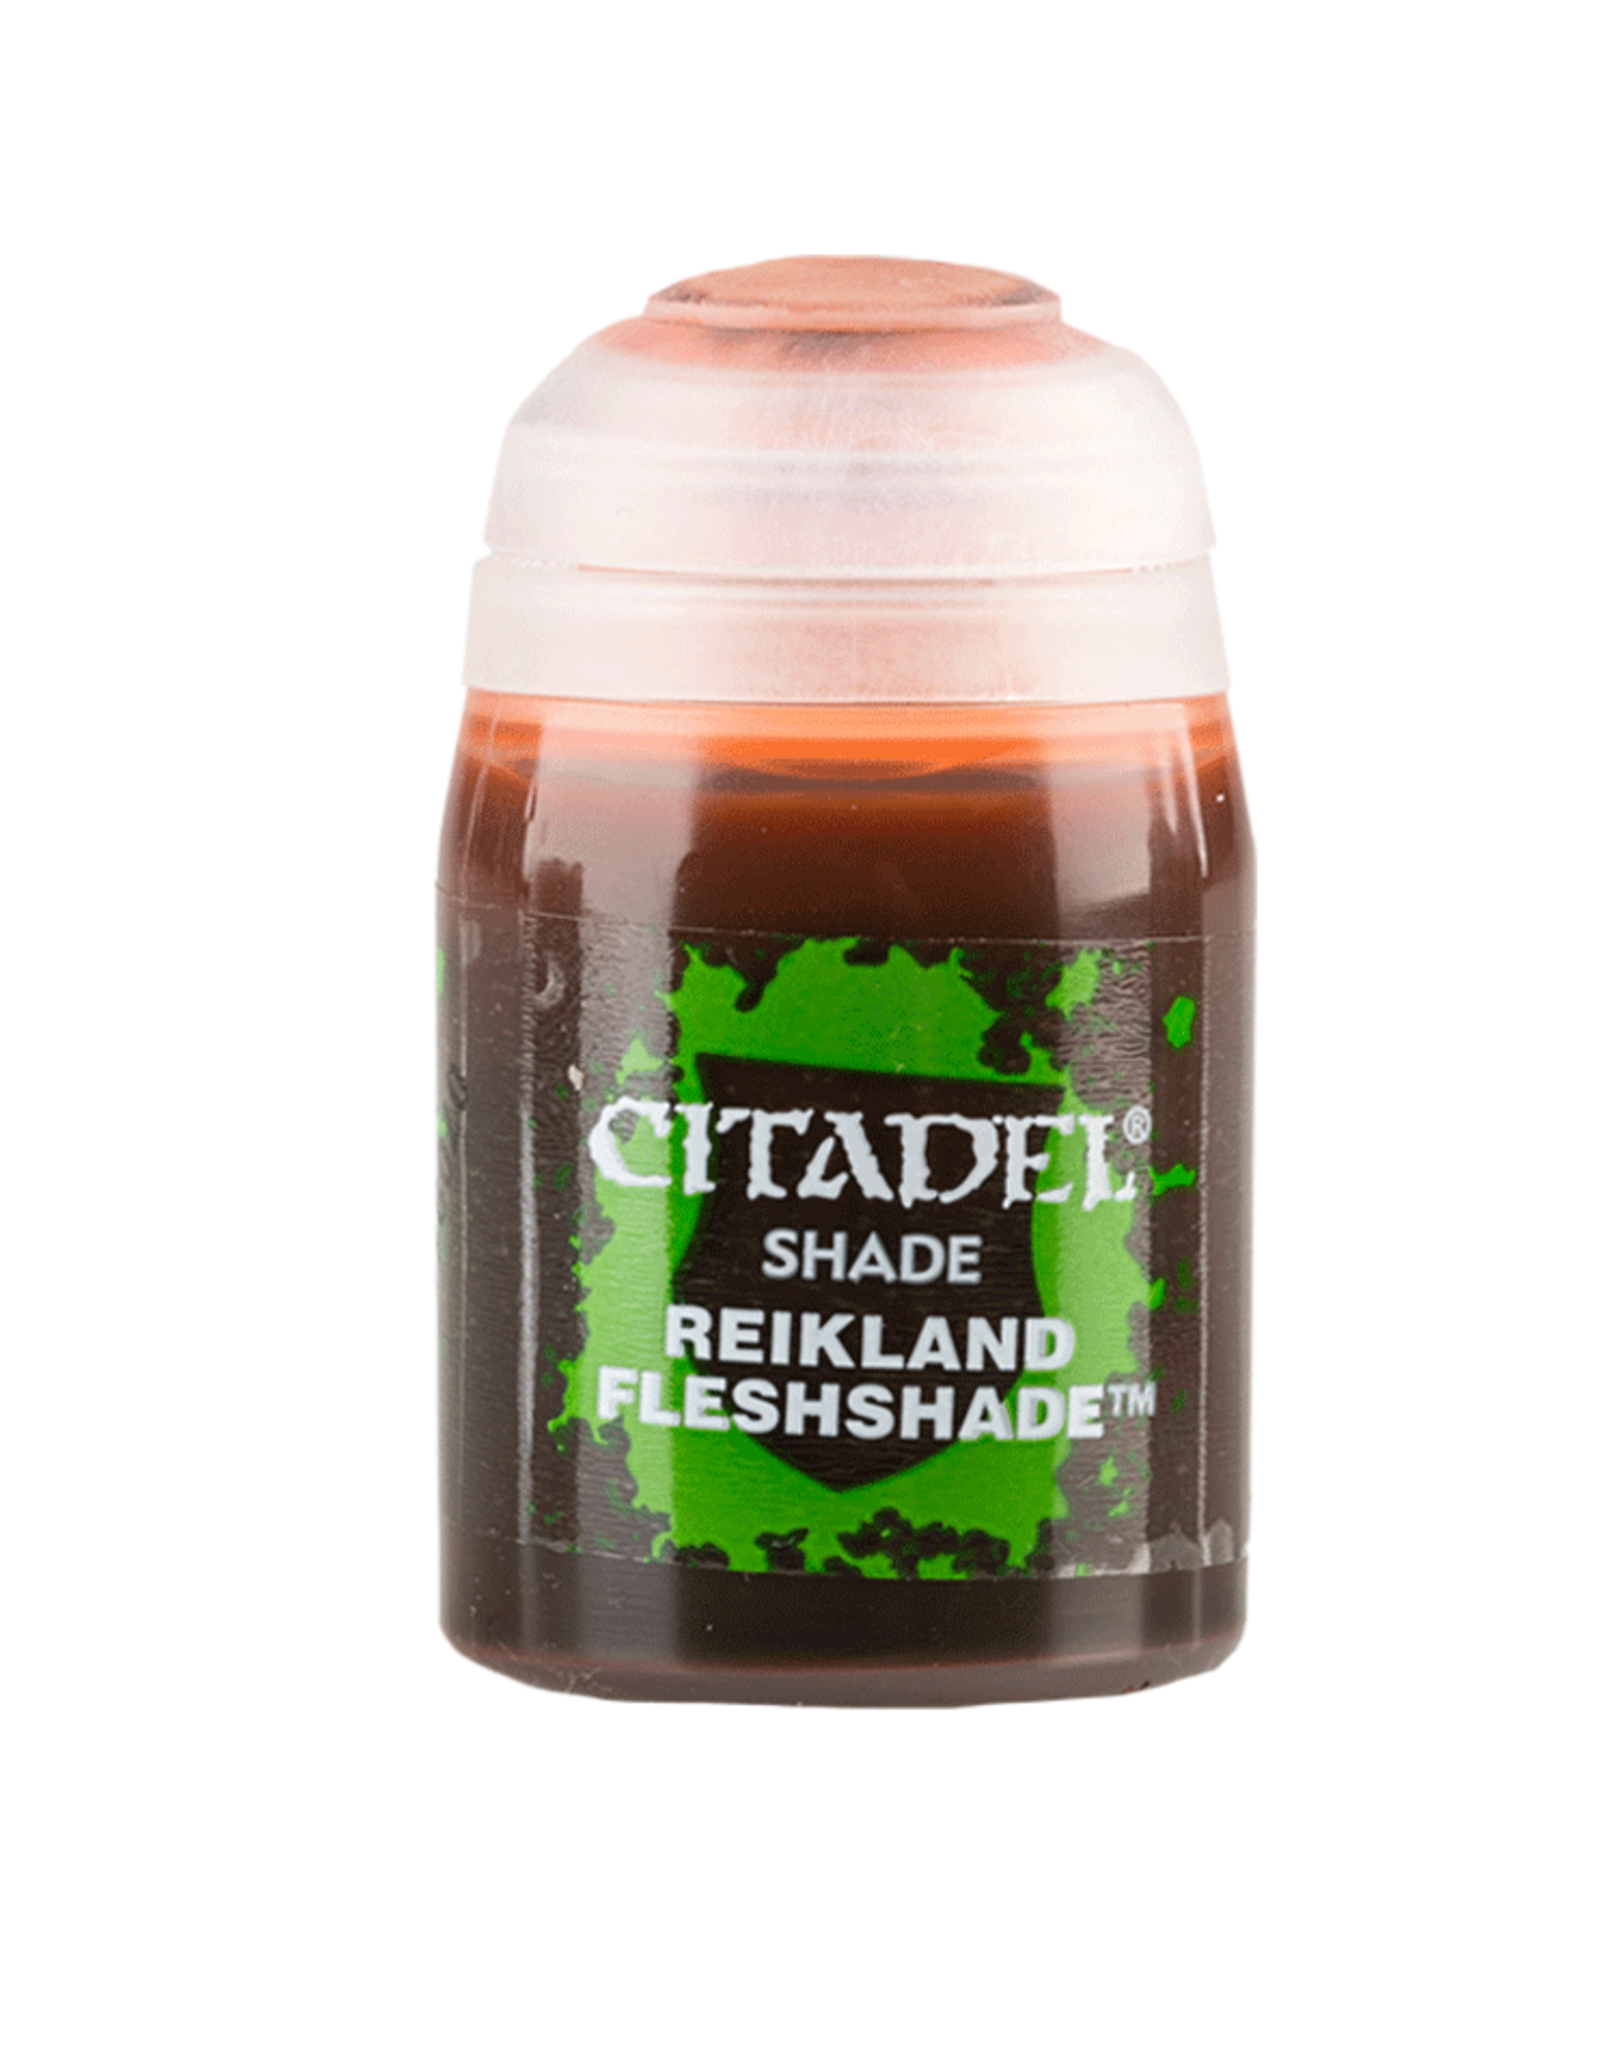 Games Workshop Citadel Shade: Reikland Fleshshade (24ml)